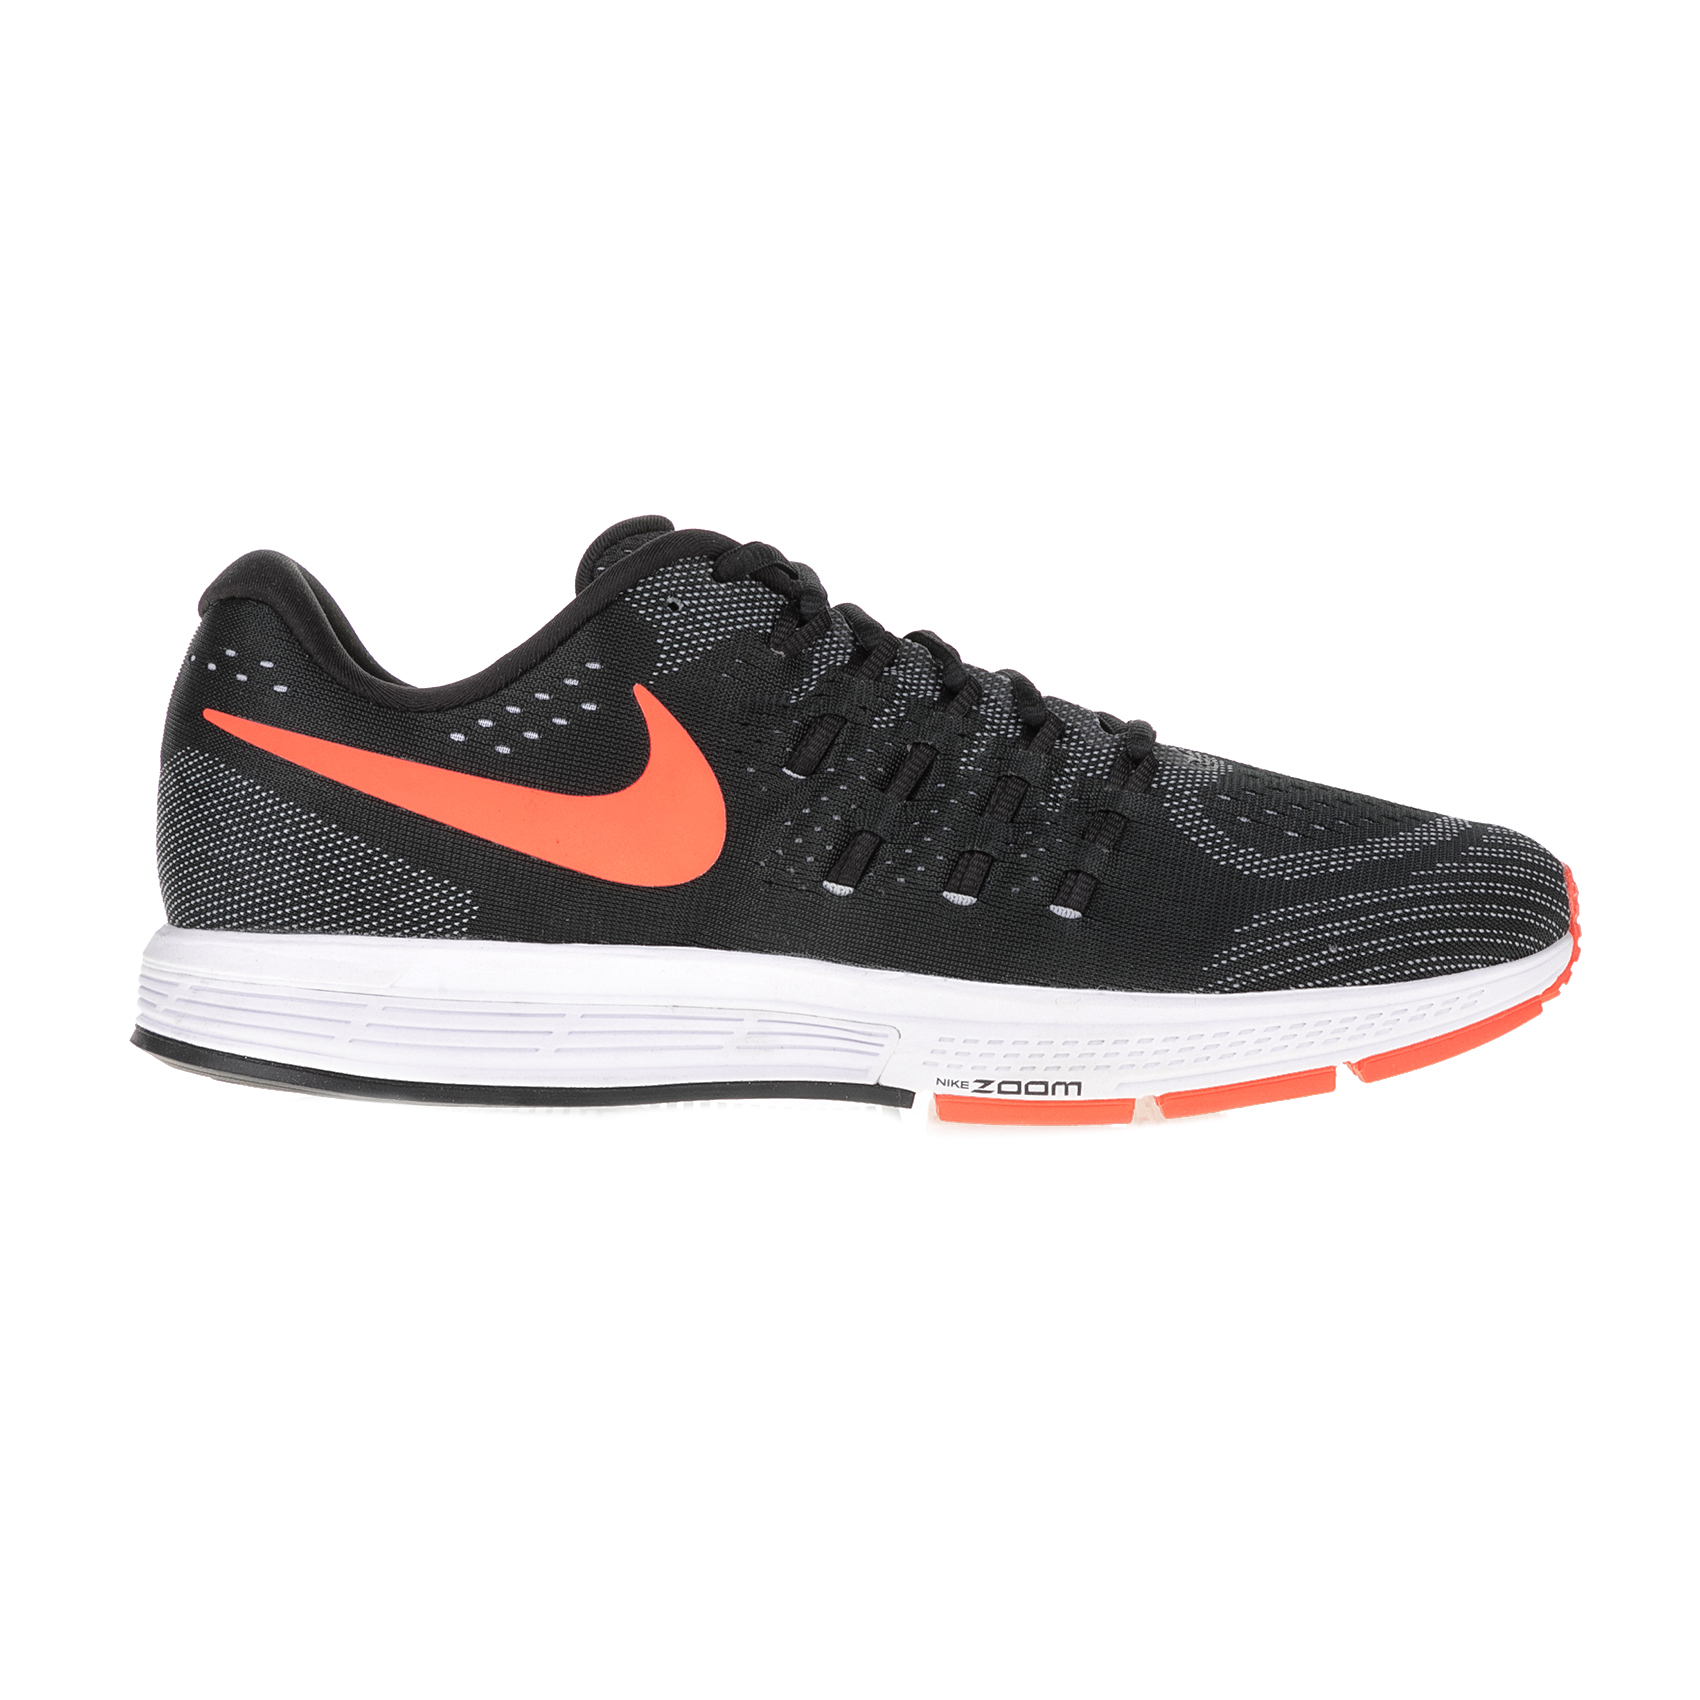 NIKE – Ανδρικά αθλητικά παπούτσια NIKE AIR ZOOM VOMERO 11 μαύρα-πορτοκαλί